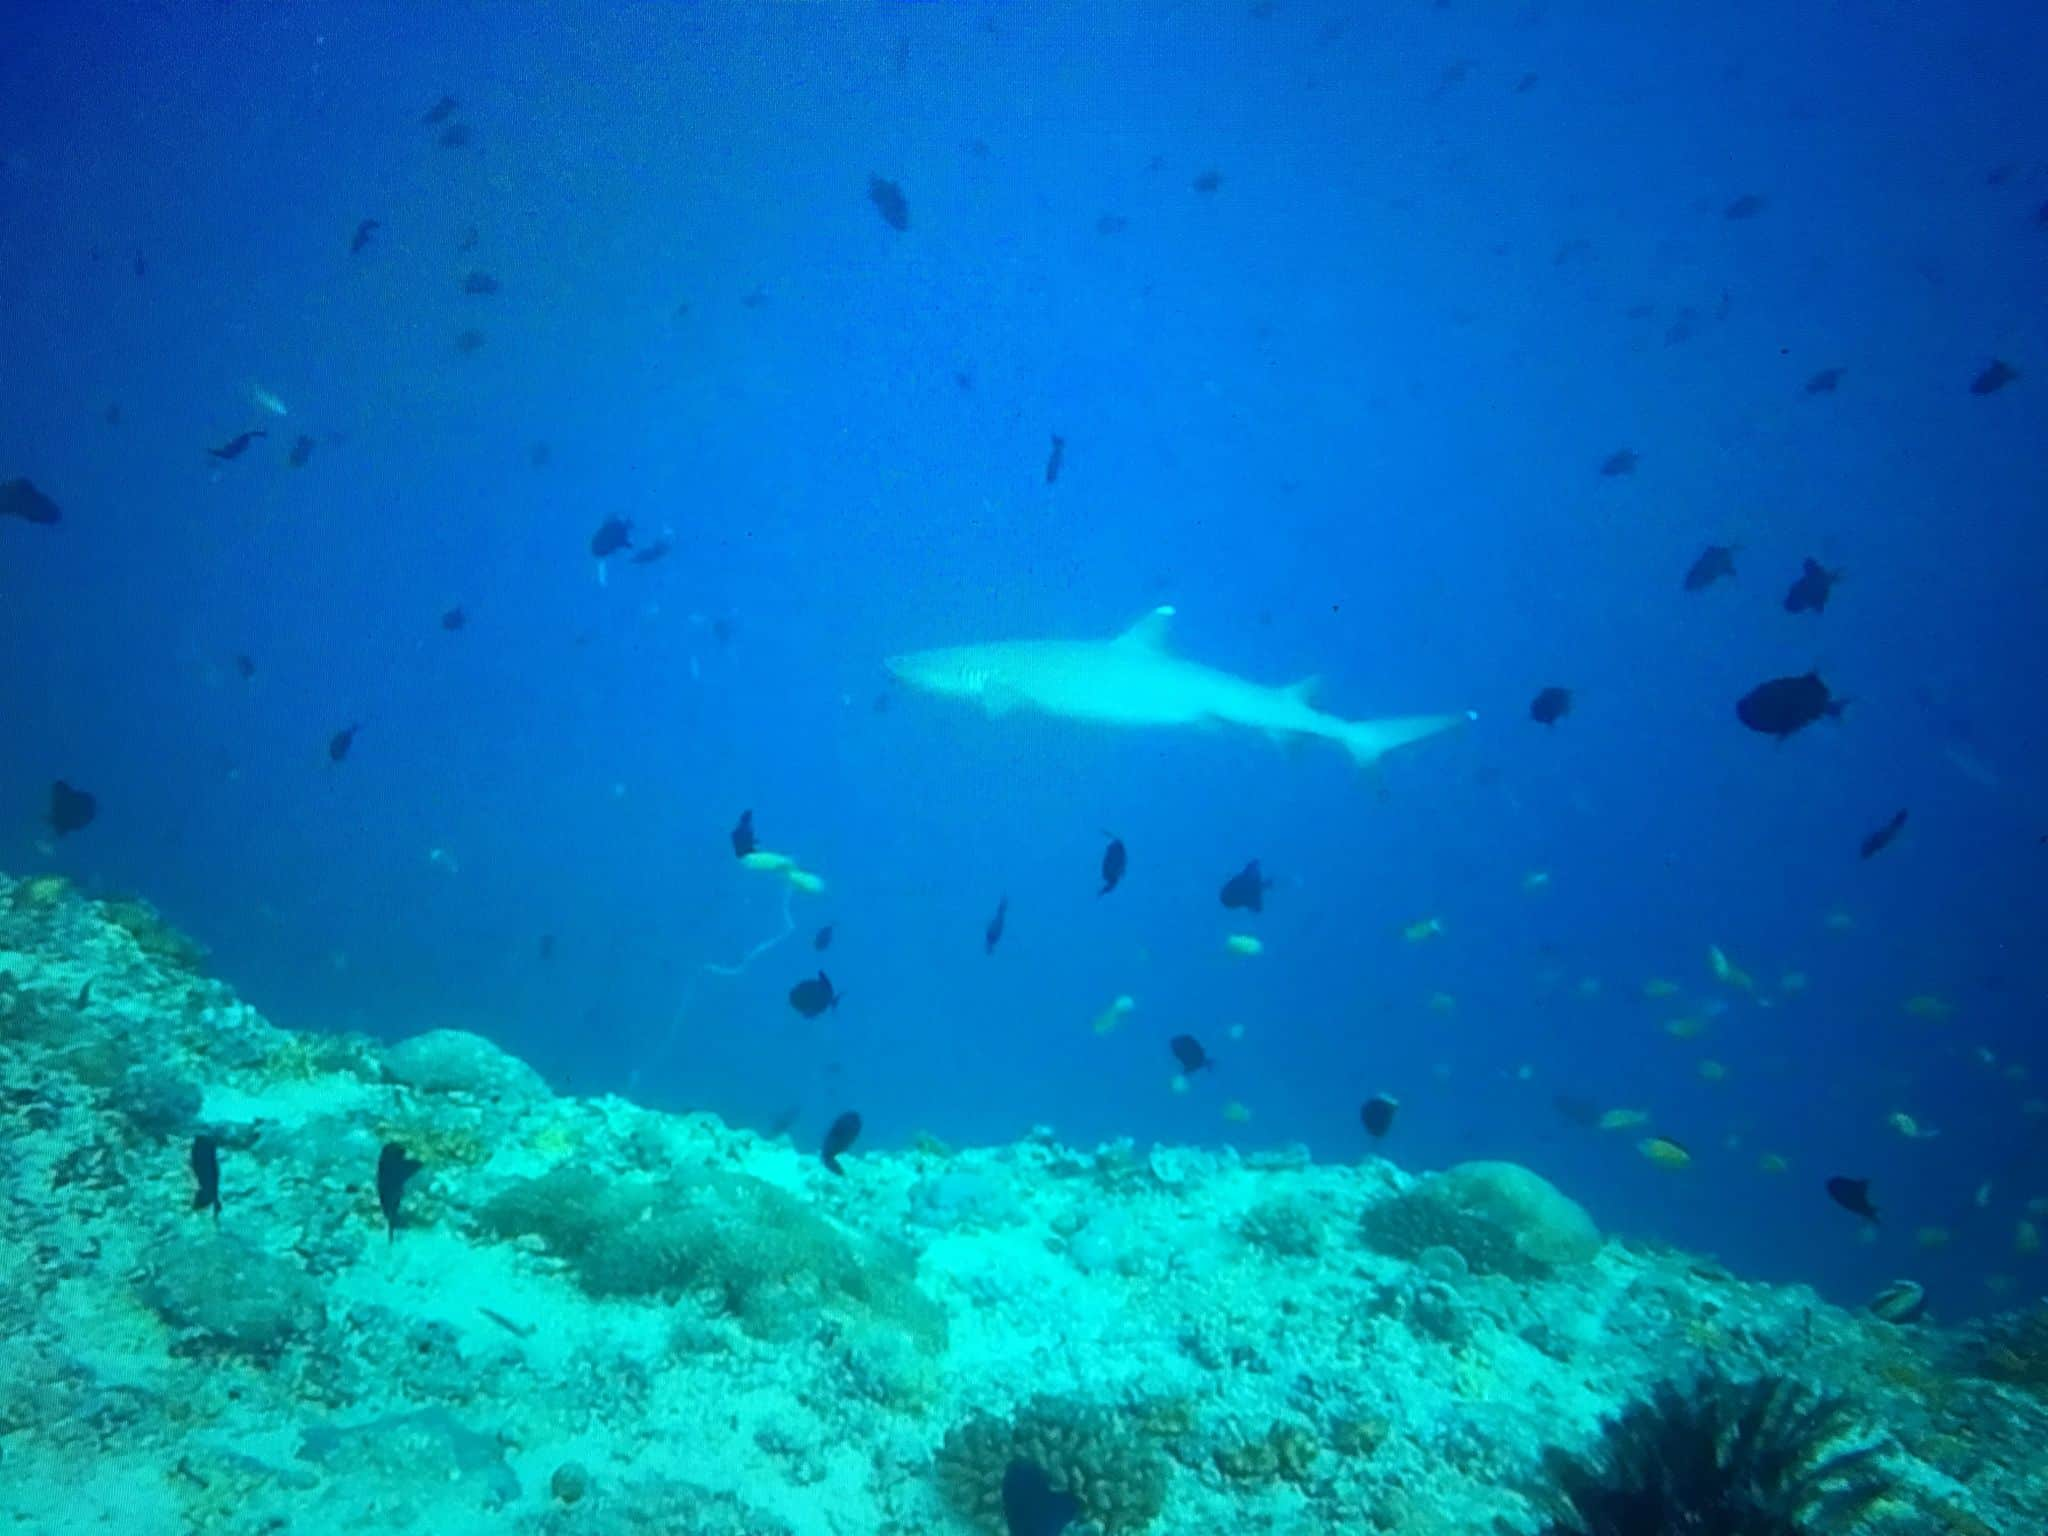 Tauchen auf Coco Palm Dhuni Kolhu: Im Baa Atoll kann man vielerorts Haie beobachten. Foto: Sascha Tegtmeyer